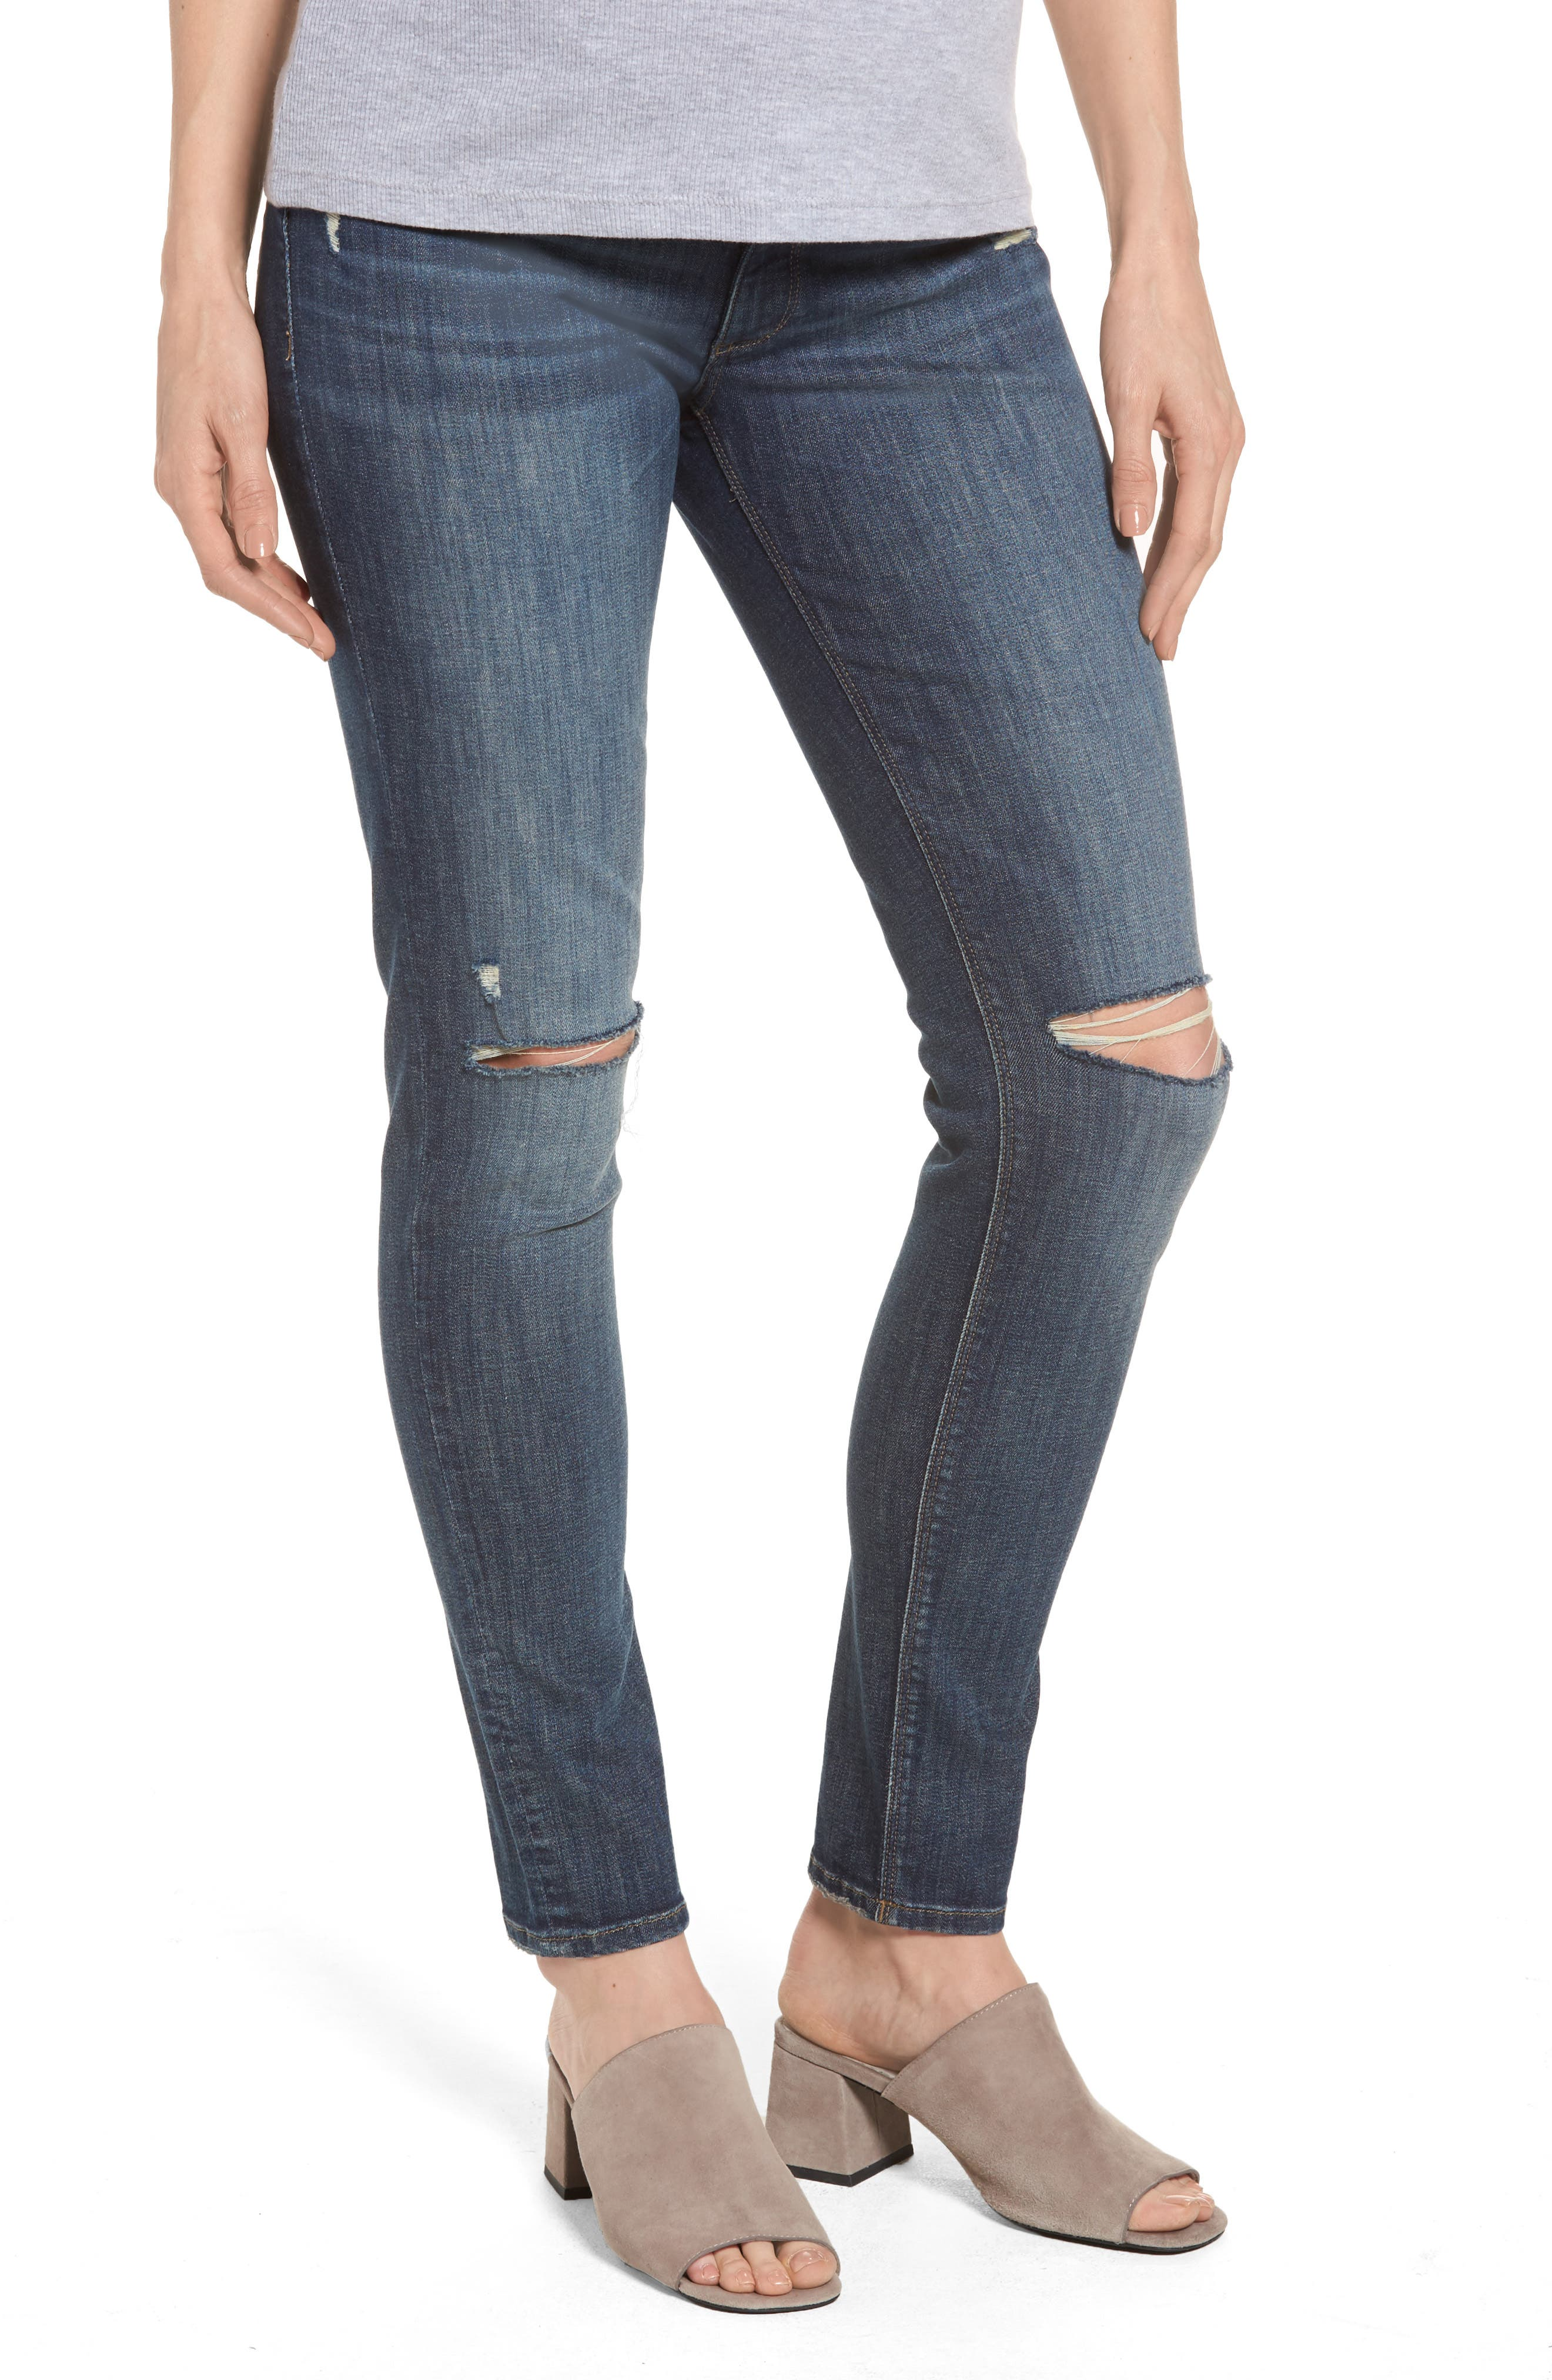 Main Image - DL1961 Emma Power Legging Maternity Jeans (Heath)